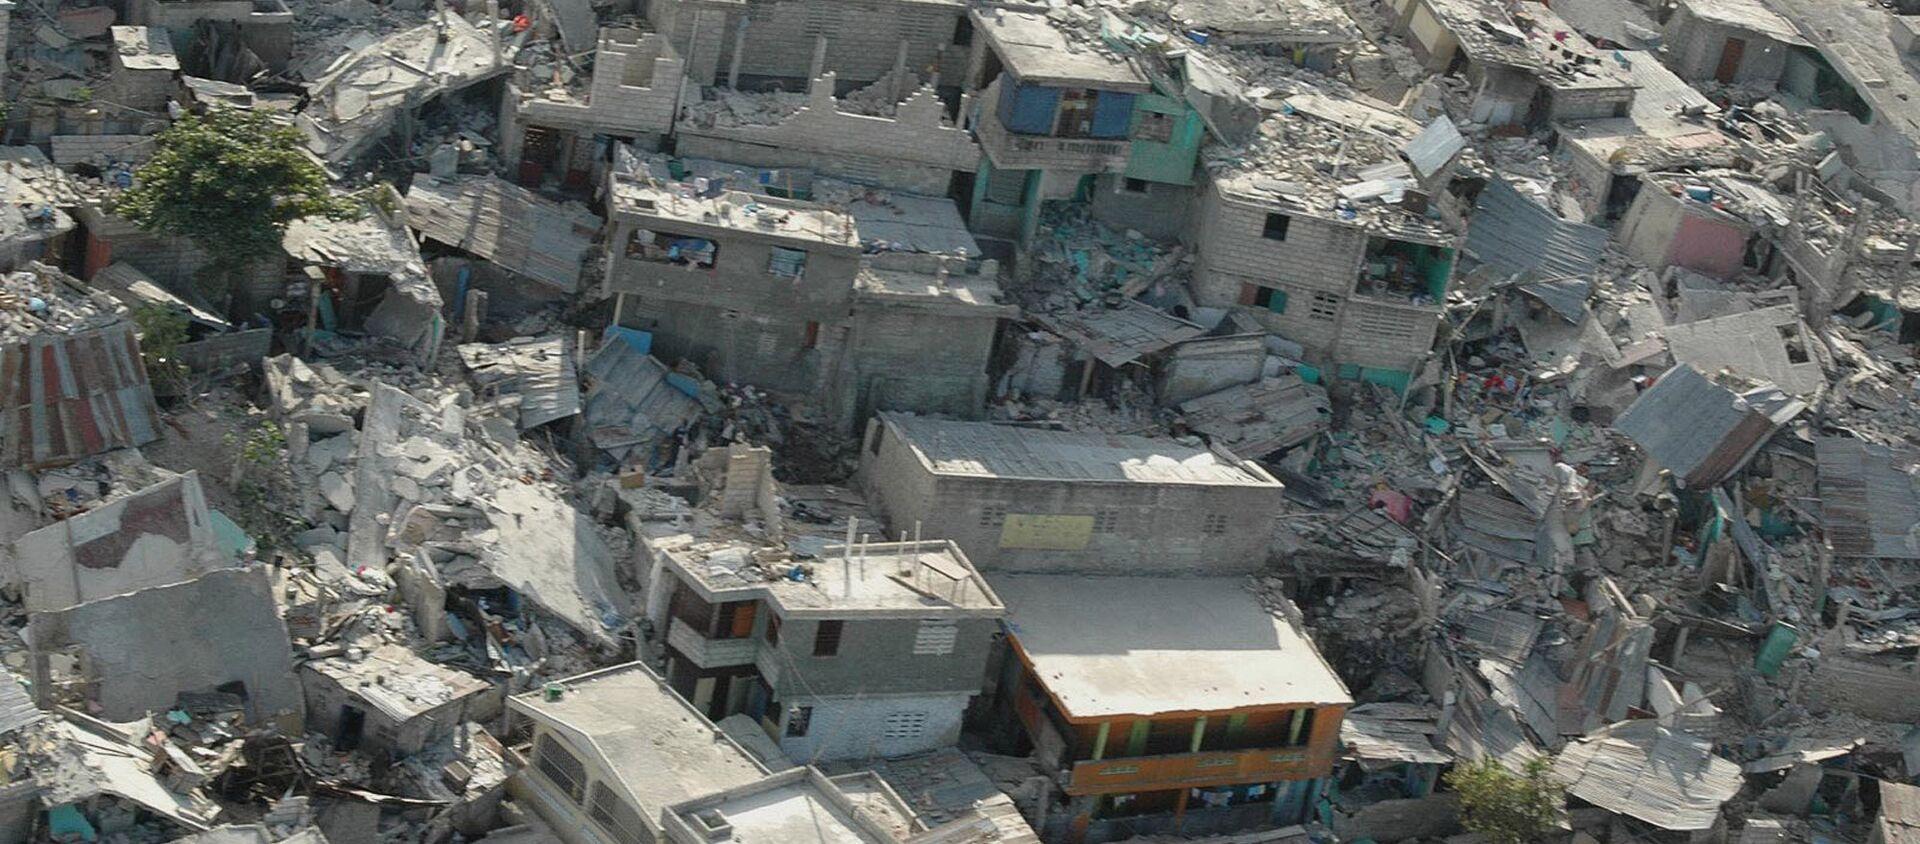 Collapsed buildings following earthquake, in Haiti's capital Port-au-Prince. (File) - Sputnik International, 1920, 14.08.2021